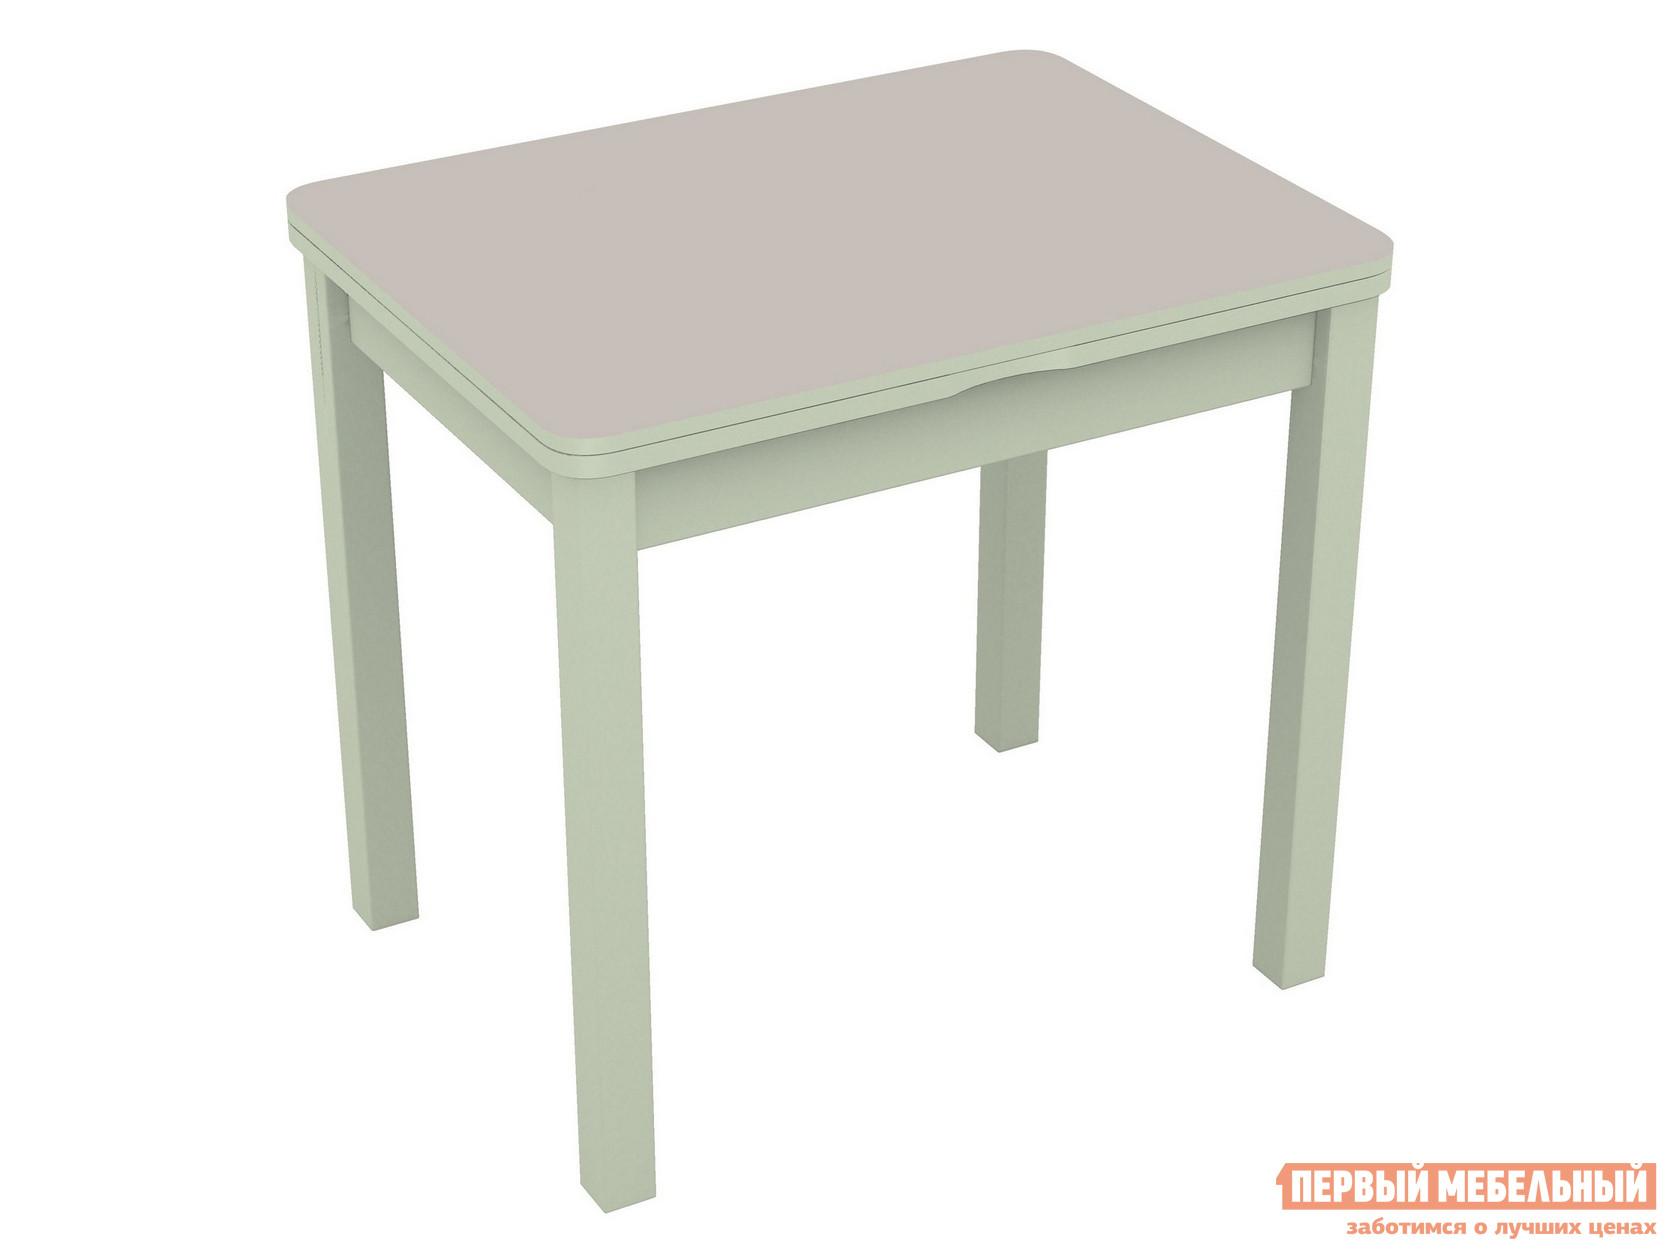 Кухонный стол Линоторг Бари - Стекло ДН